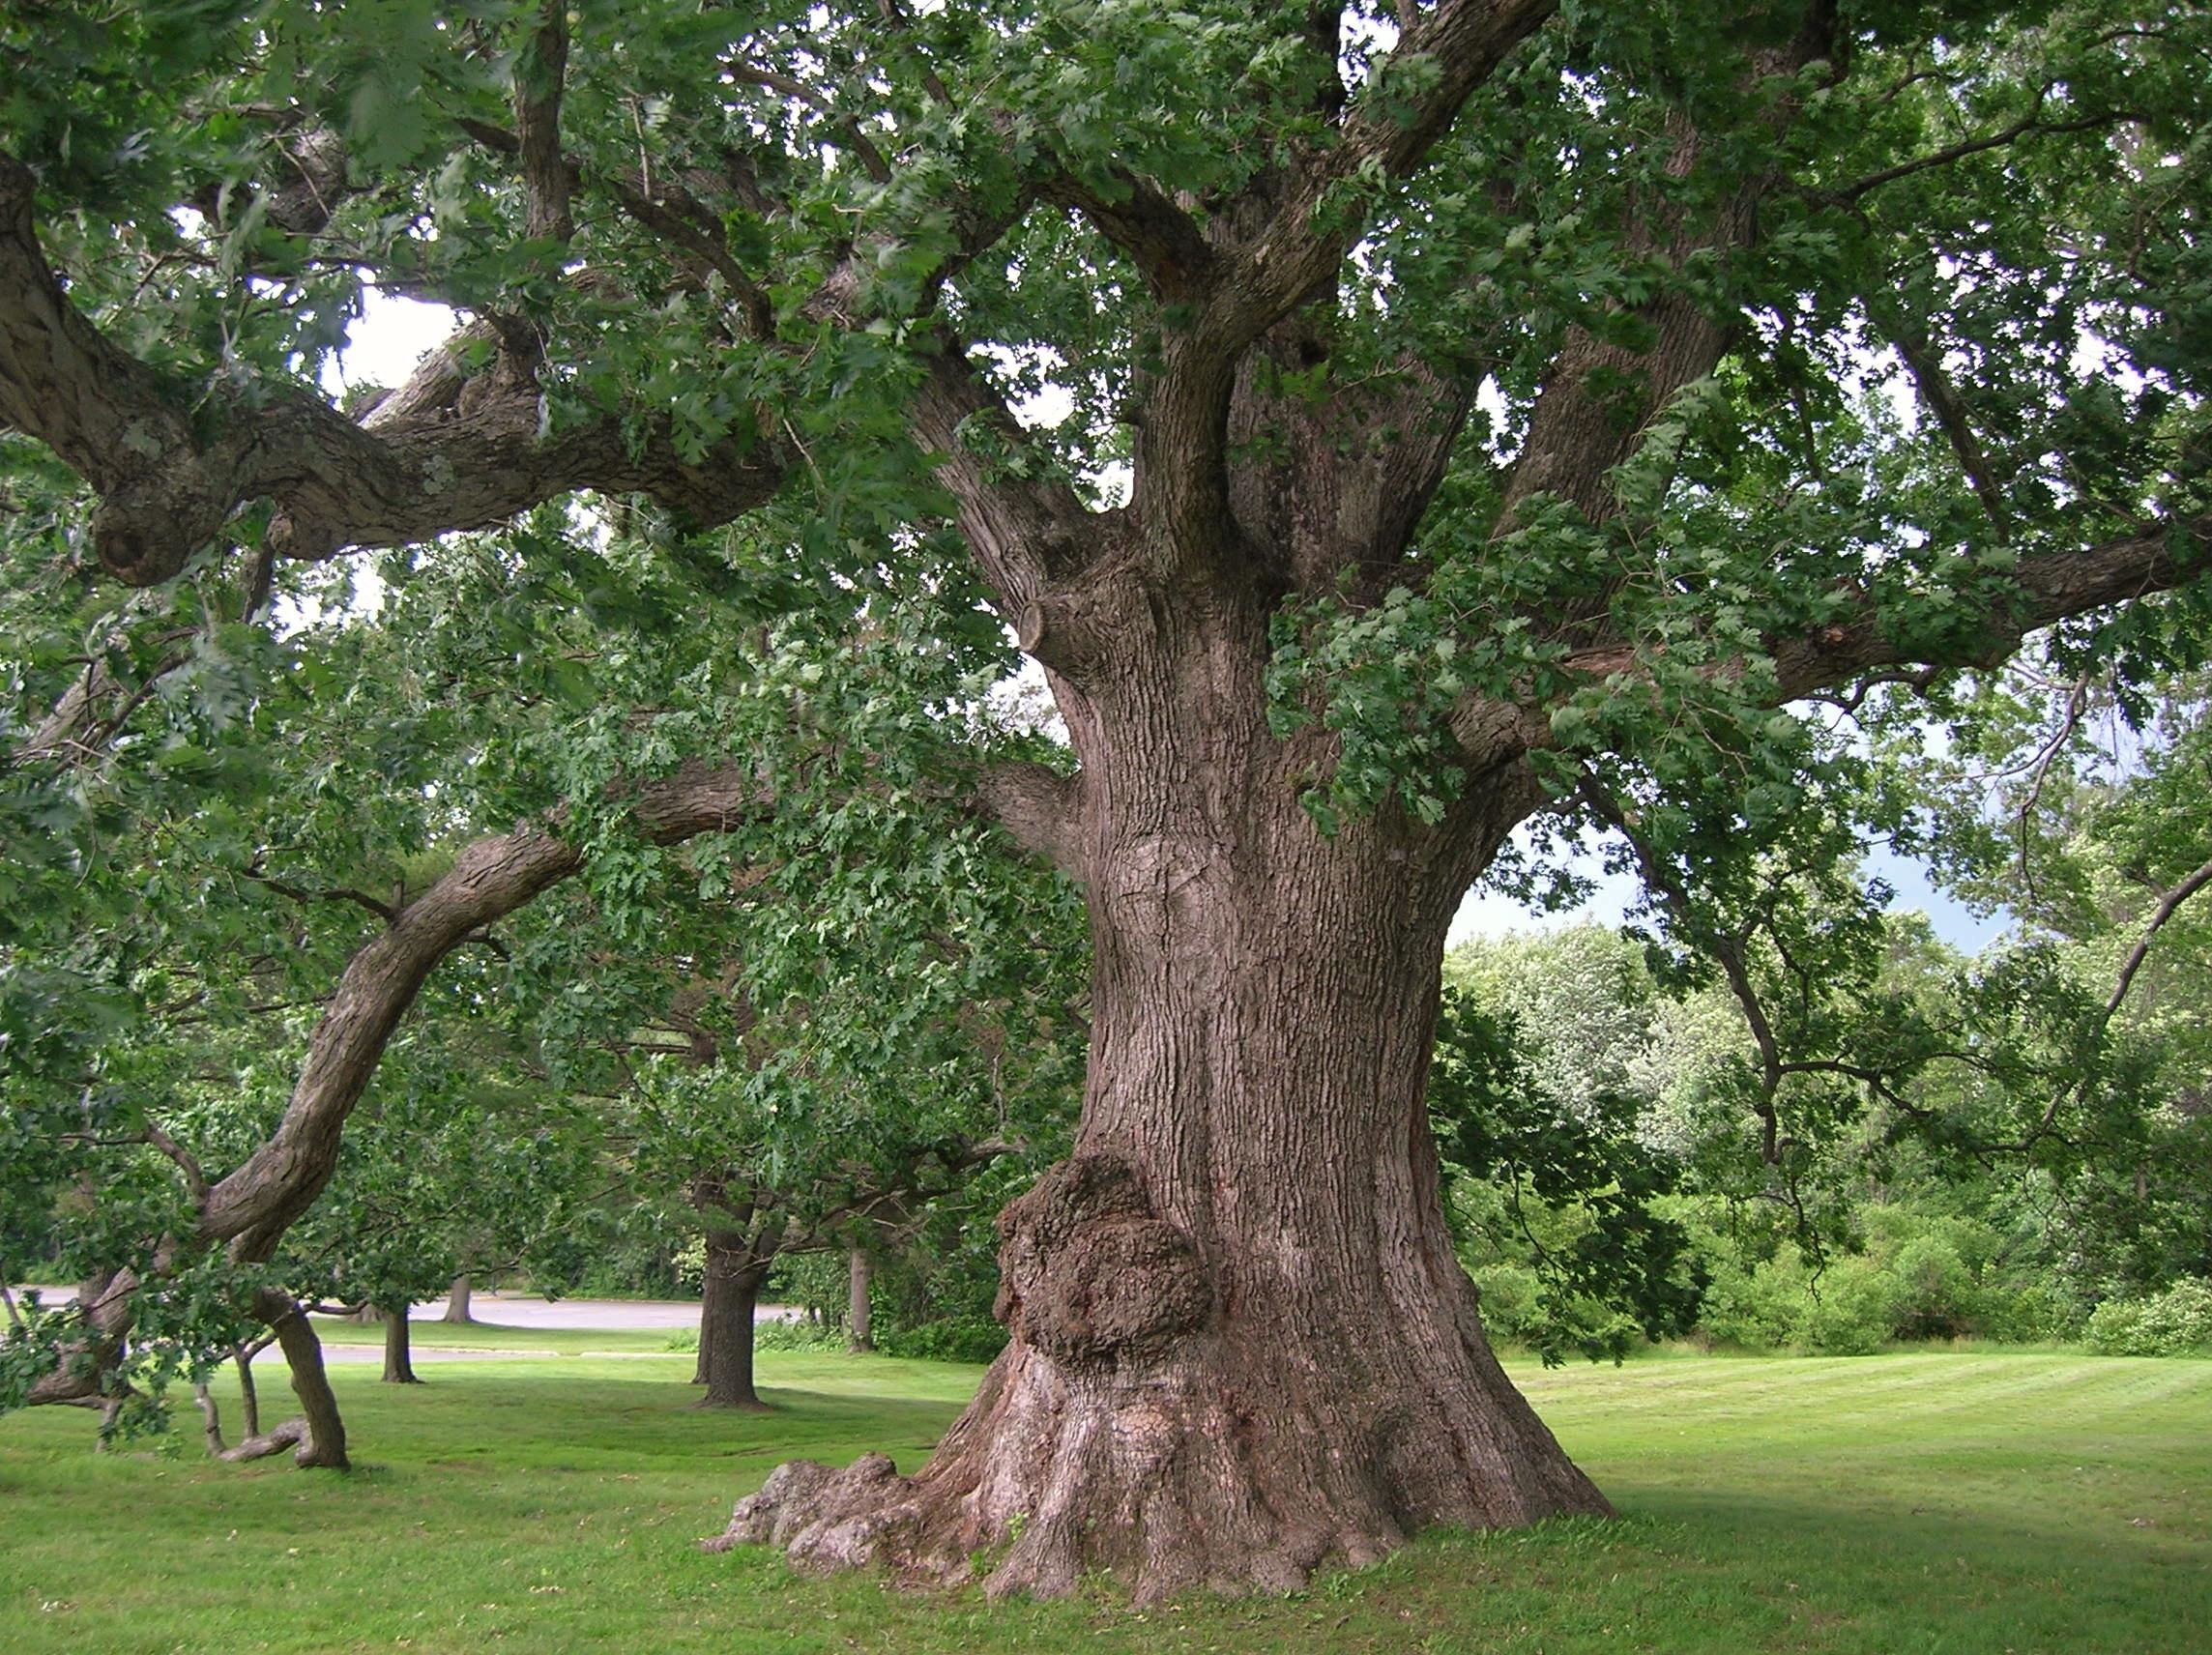 White Oak Tree, West Hartford, CT - June 17, 2013